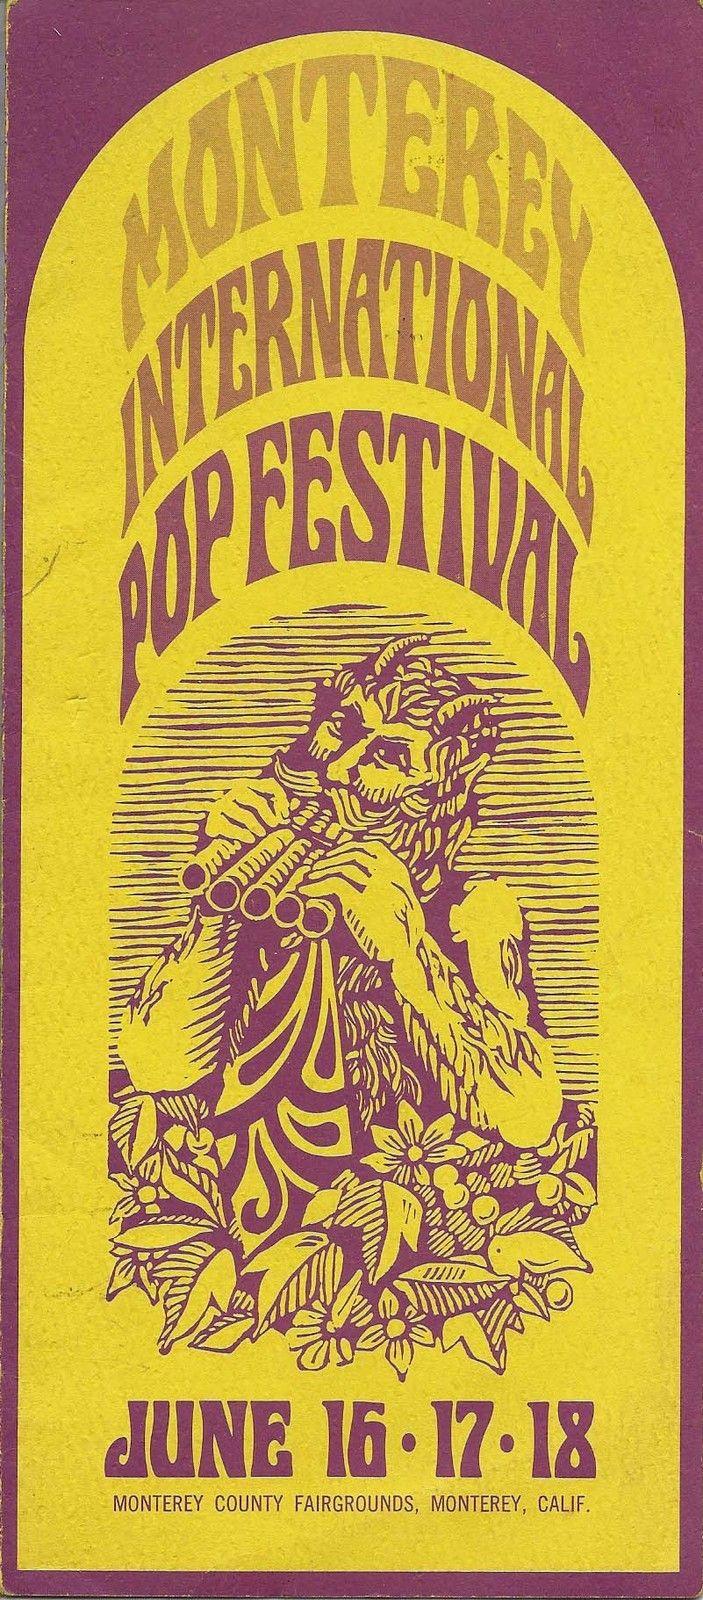 1967 Monterey Pop Festival Jimi Hendrix, Janis Joplin Concert Handbill,Tix. Form | eBay